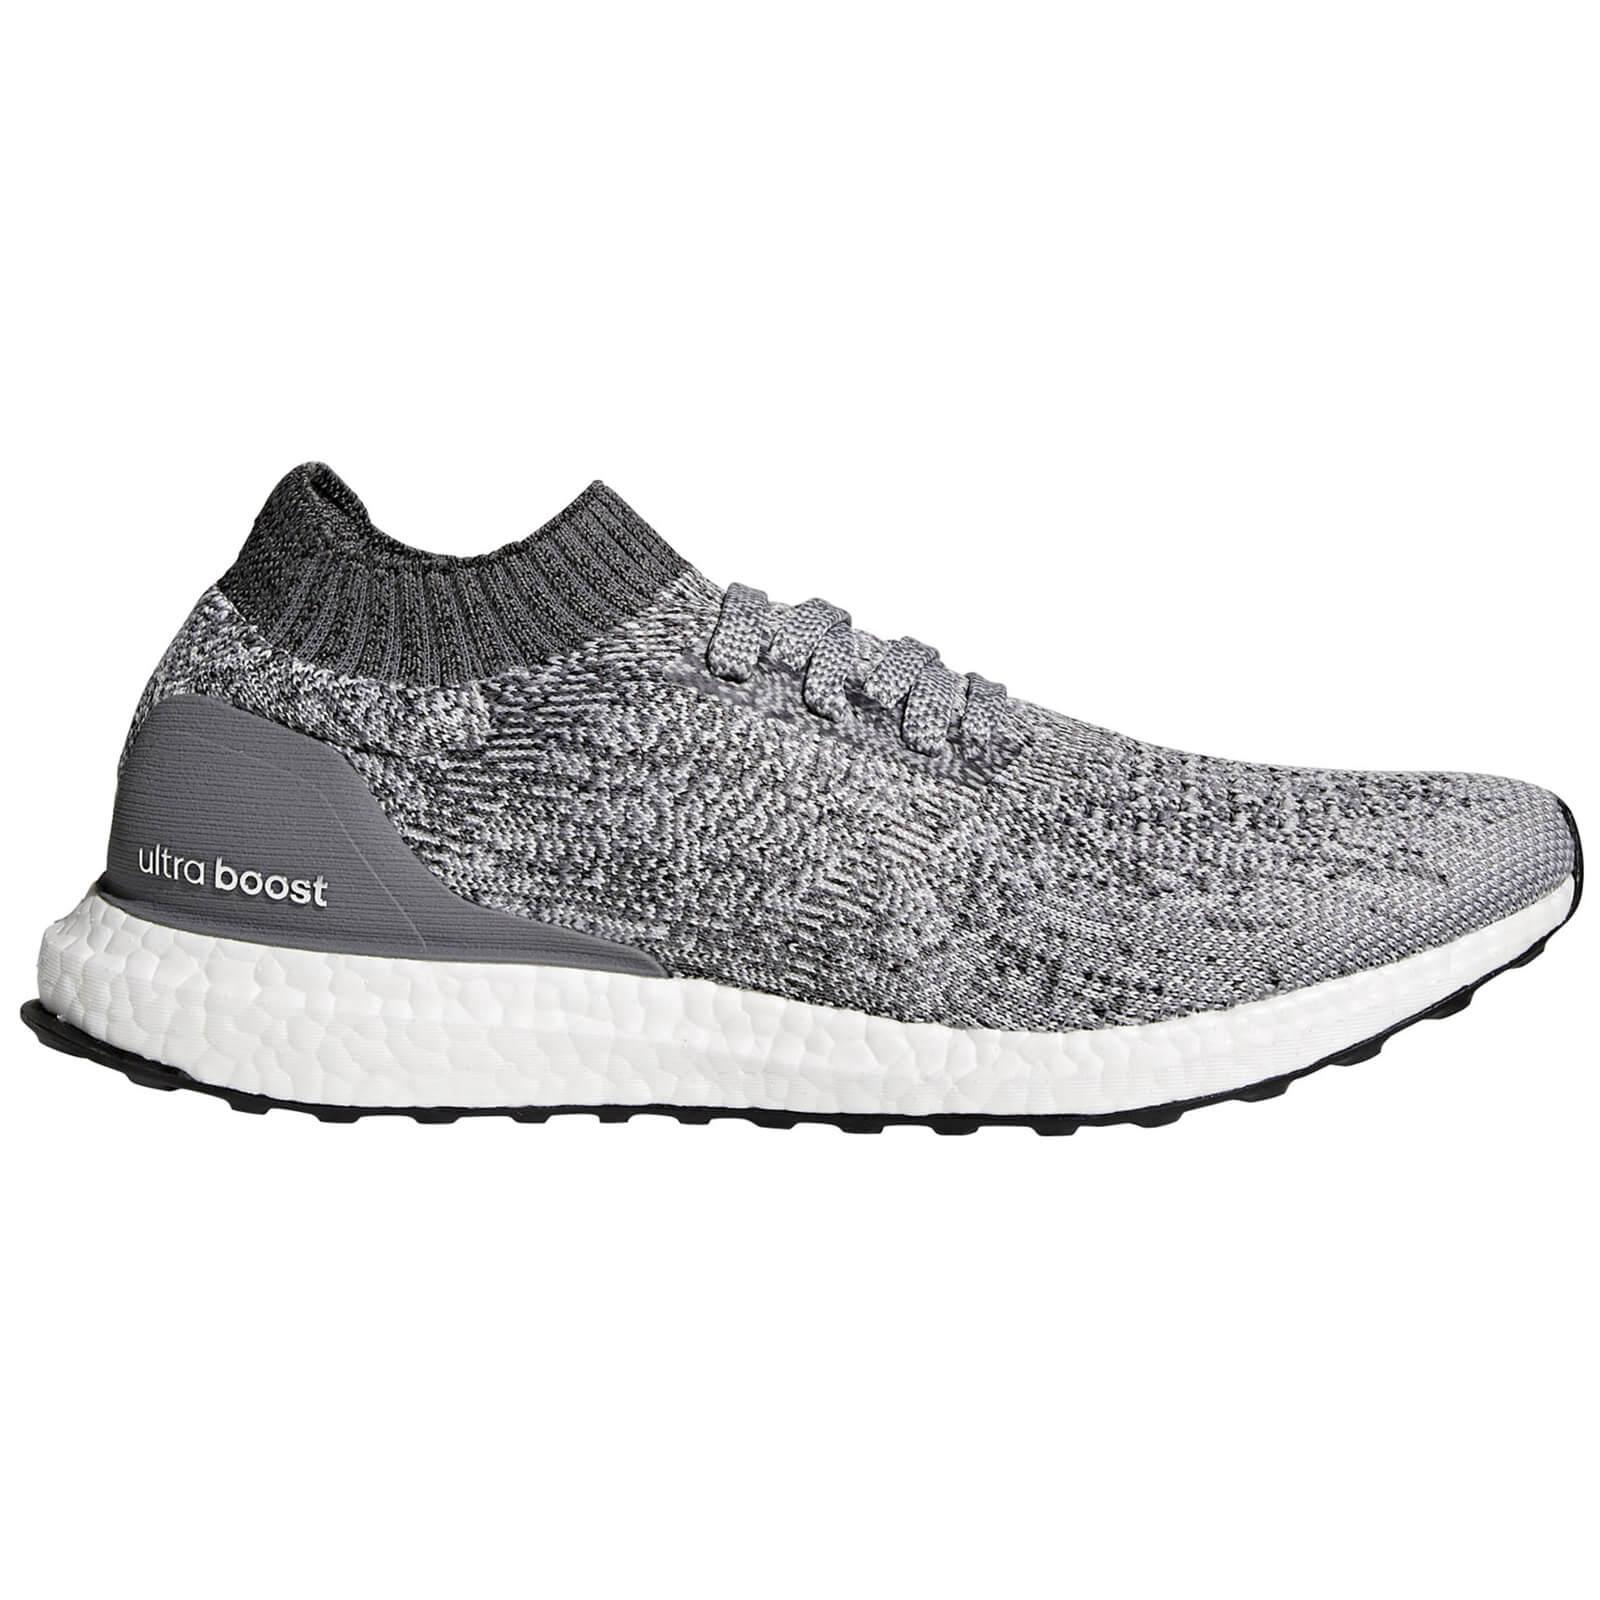 Adidas Men's Ultraboost Uncaged Laufschuhe - Grey Two - US 10/UK 9.5 - Grau